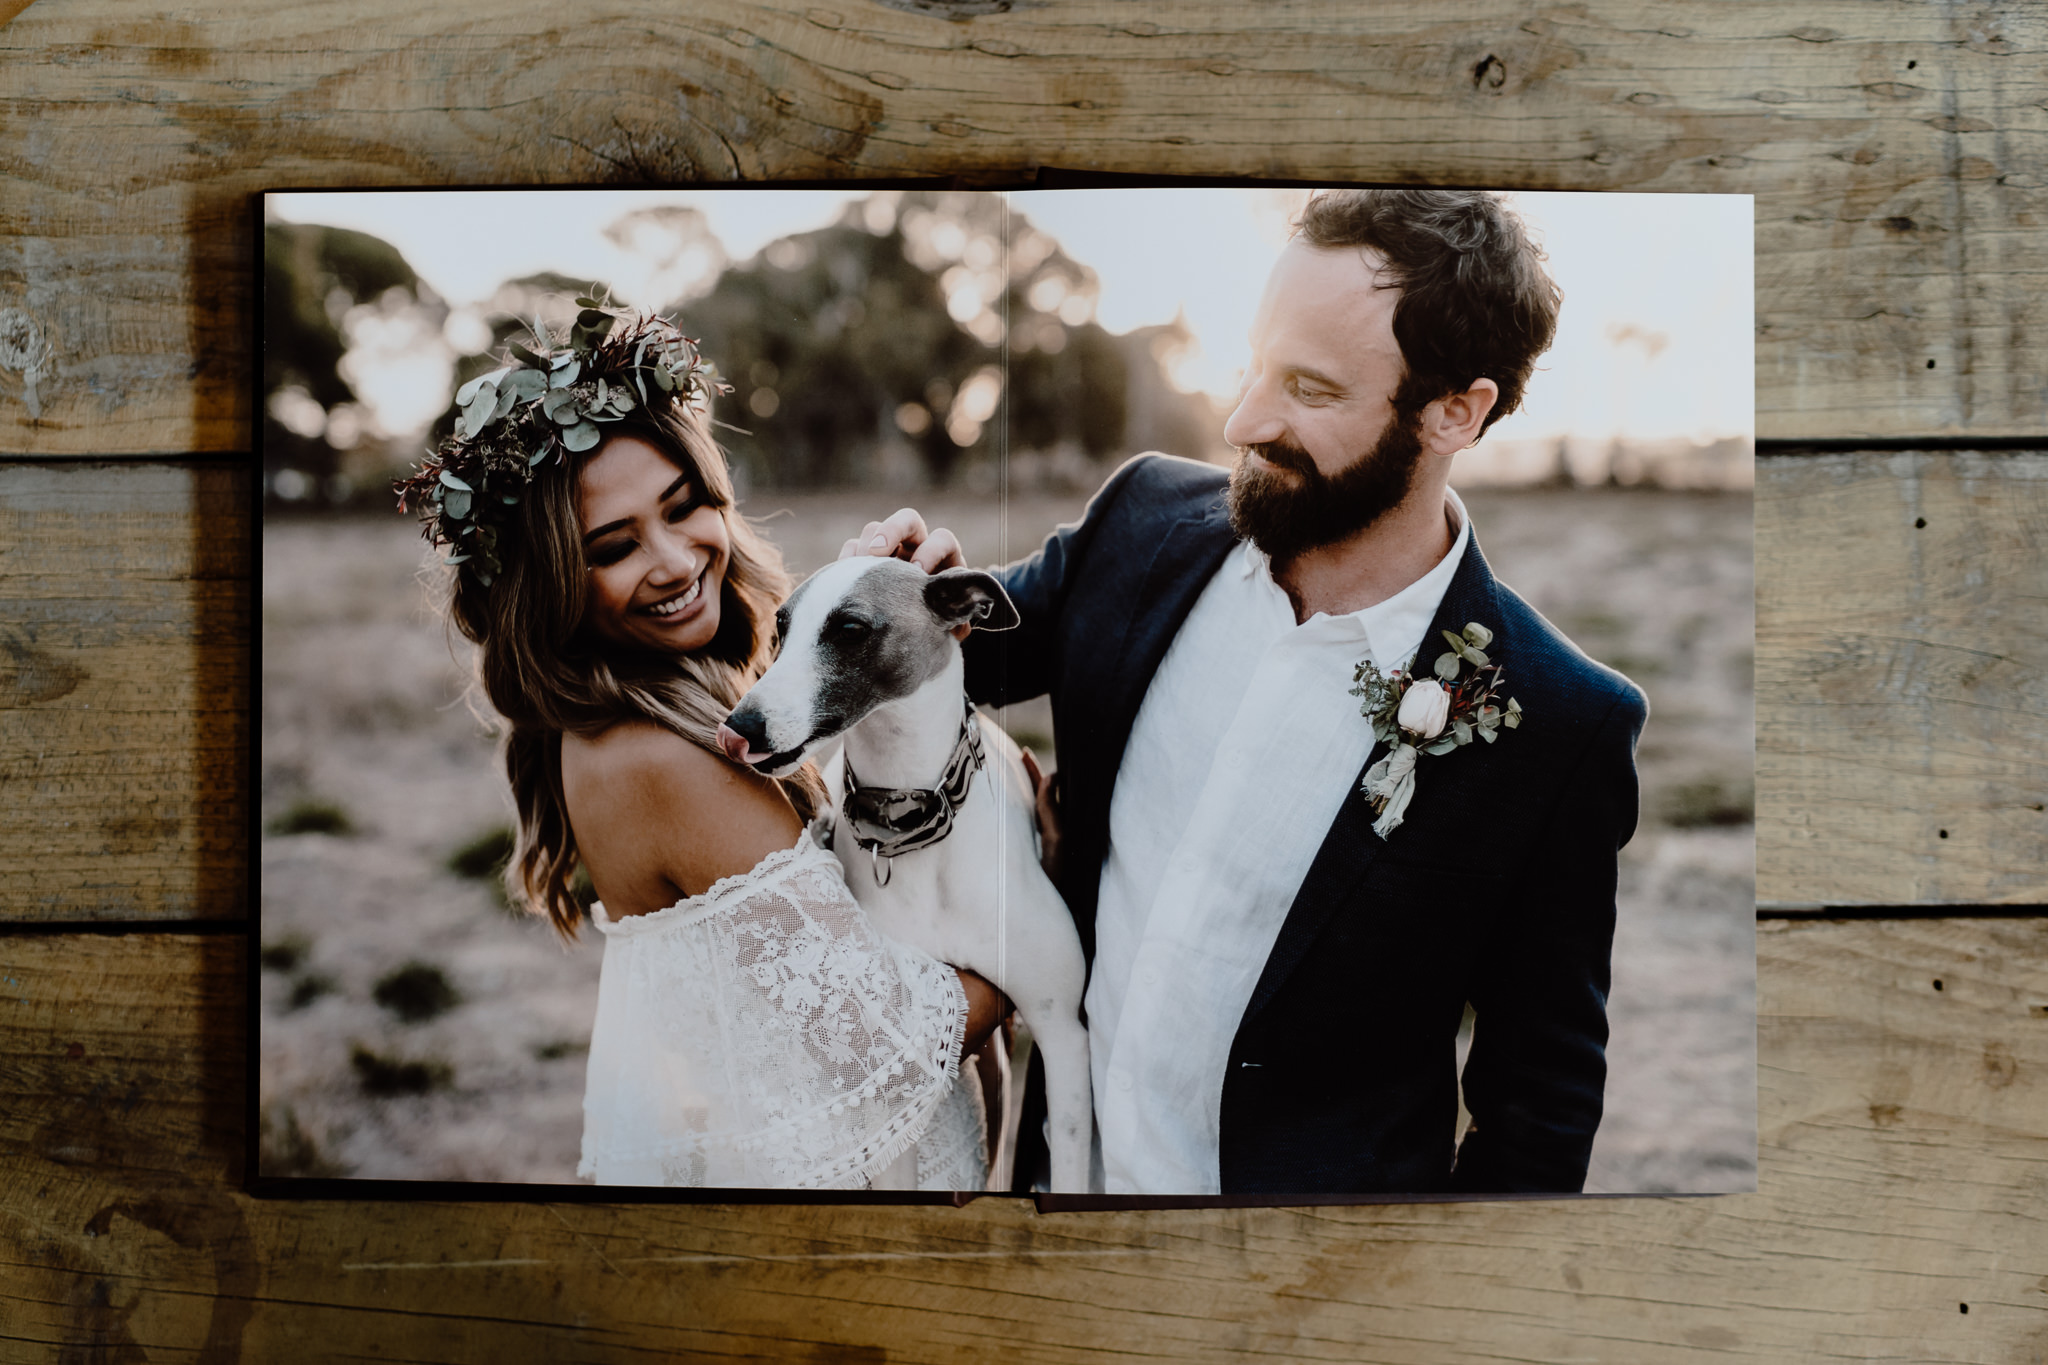 Yarra Valley Wedding Photography Ashleigh Haase-12.jpg